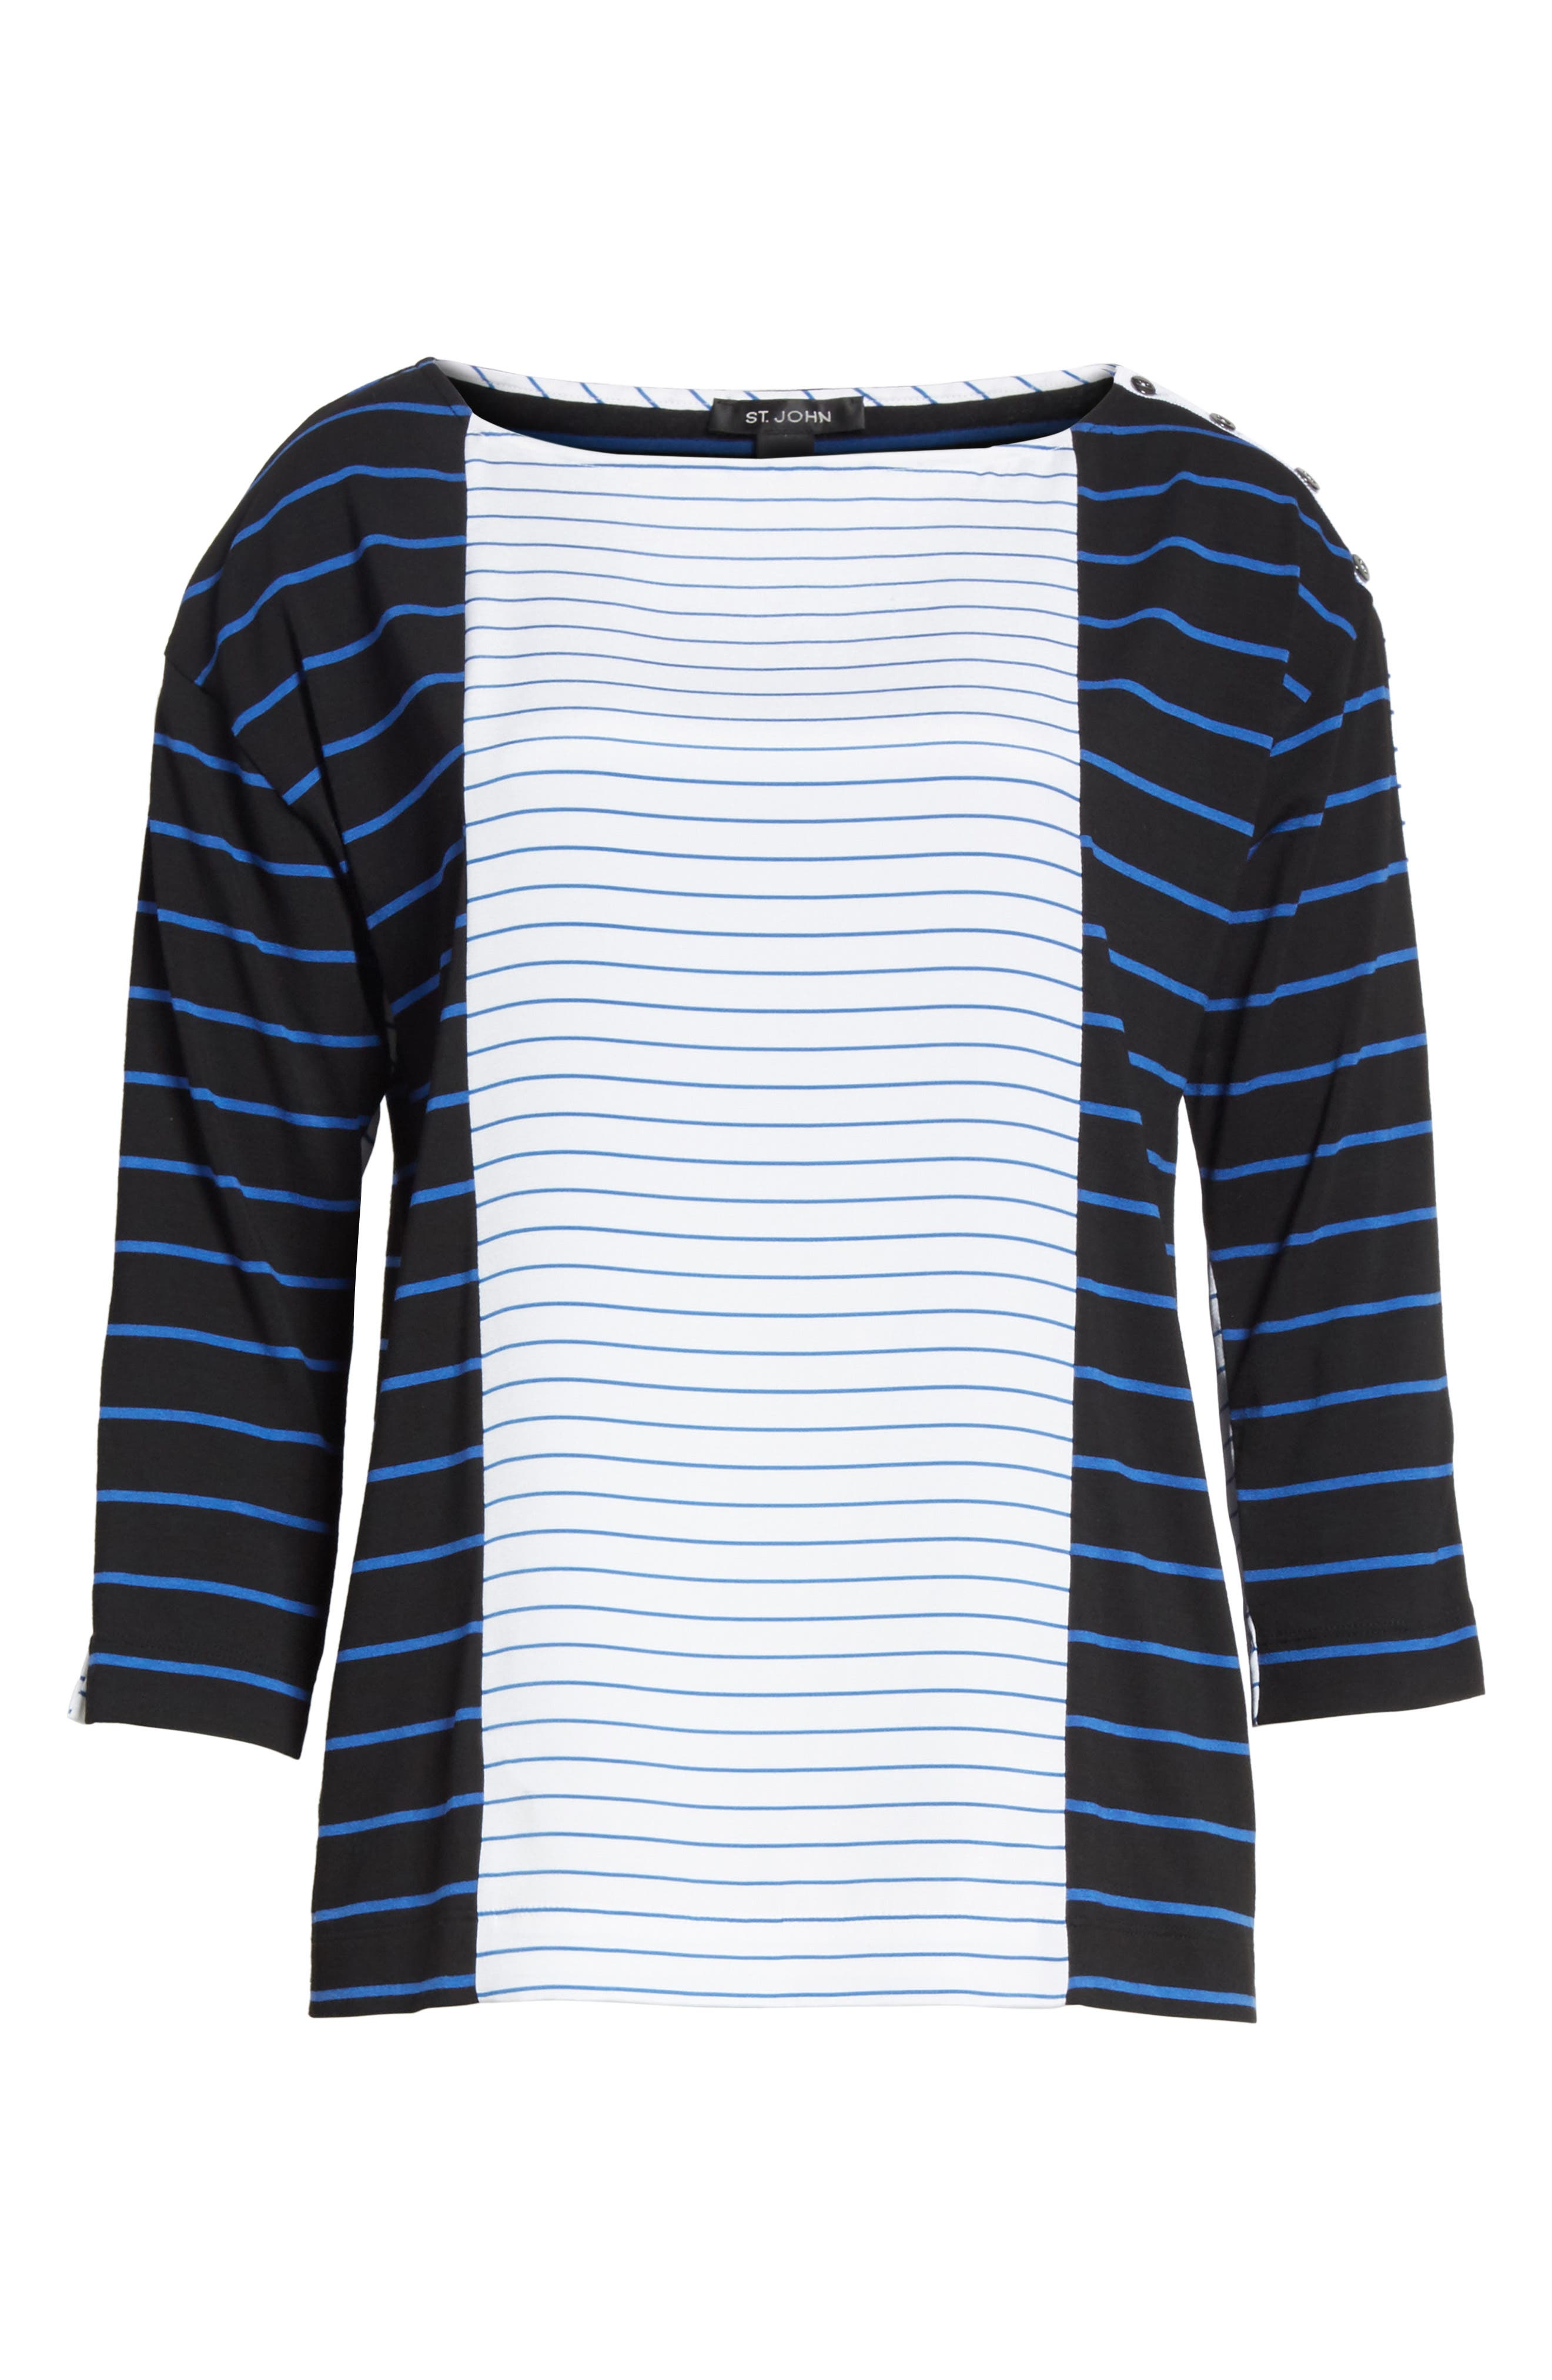 Yarn Dyed Stripe Jersey Top,                             Alternate thumbnail 6, color,                             Caviar/ Niagara/ Bianco